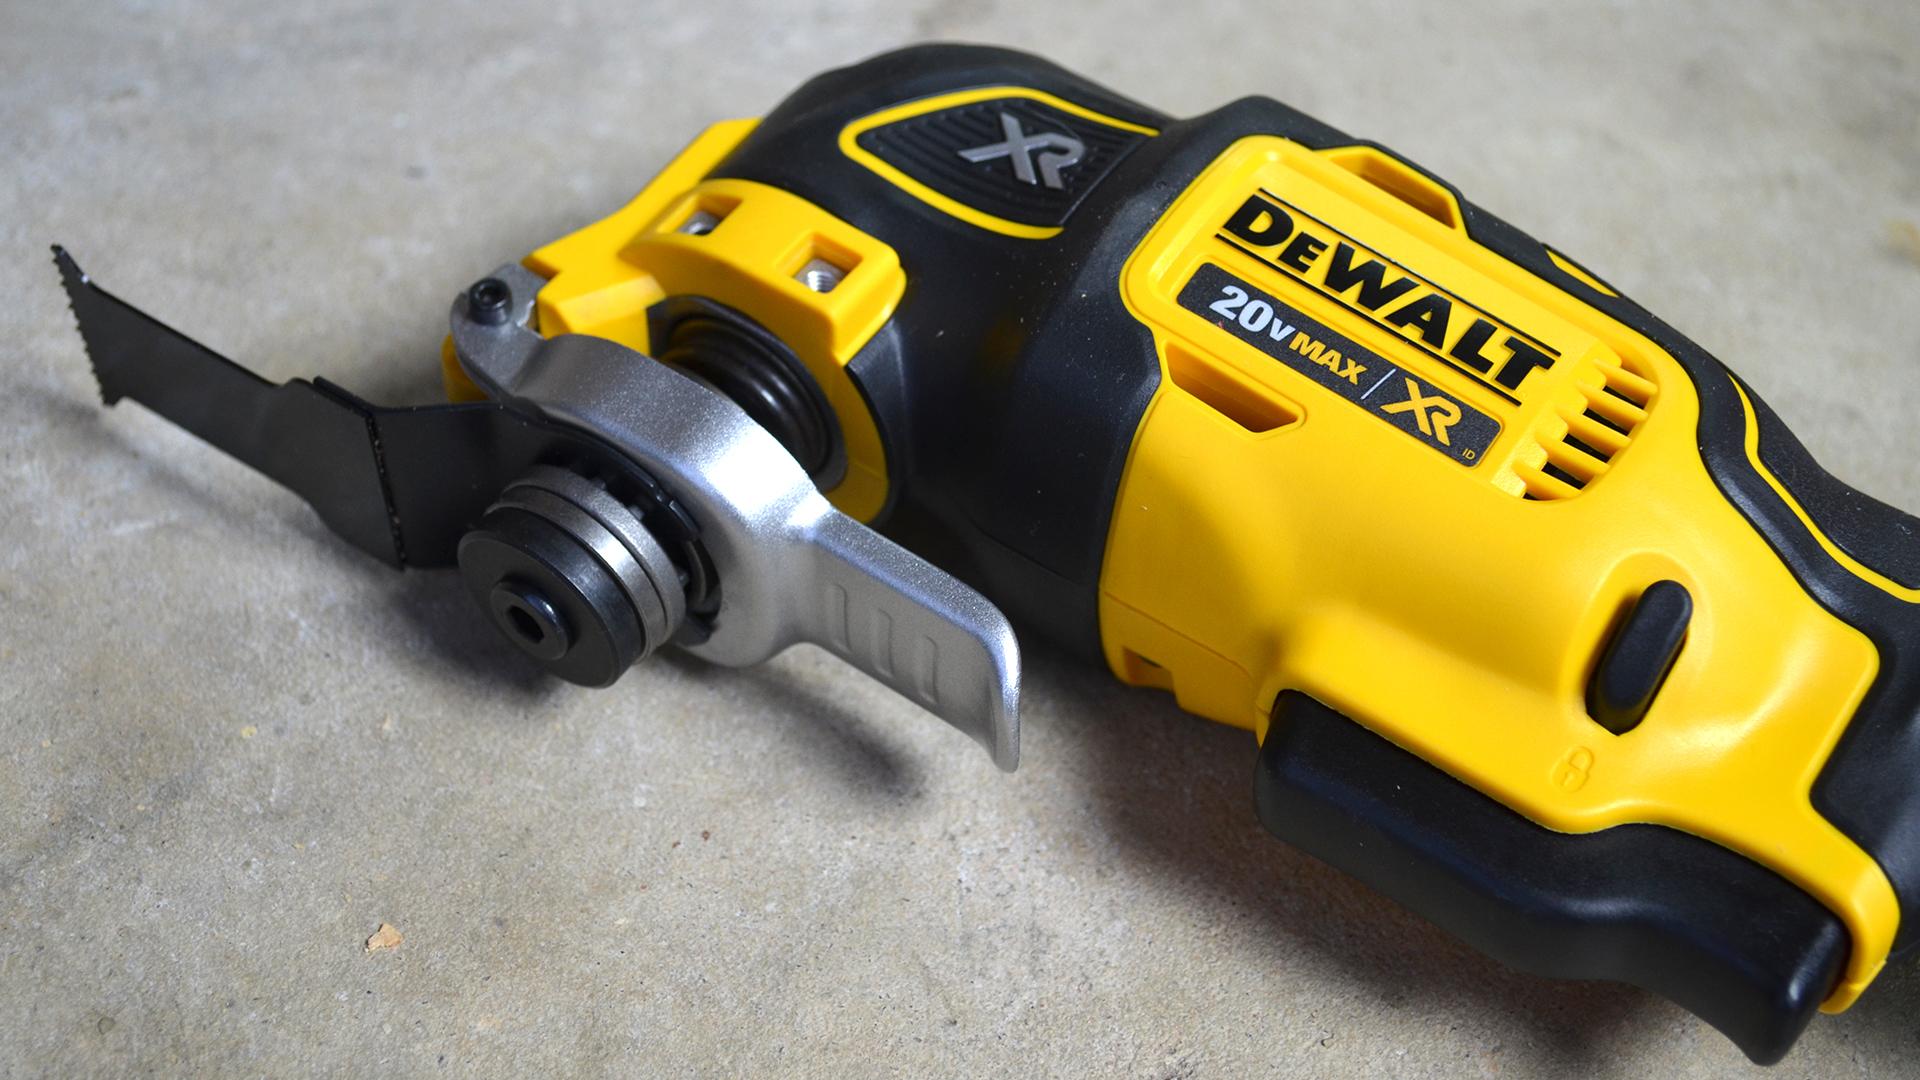 DeWalt-3-Tool-20v-MAX-Cordless-Combo-Kit-oscillator